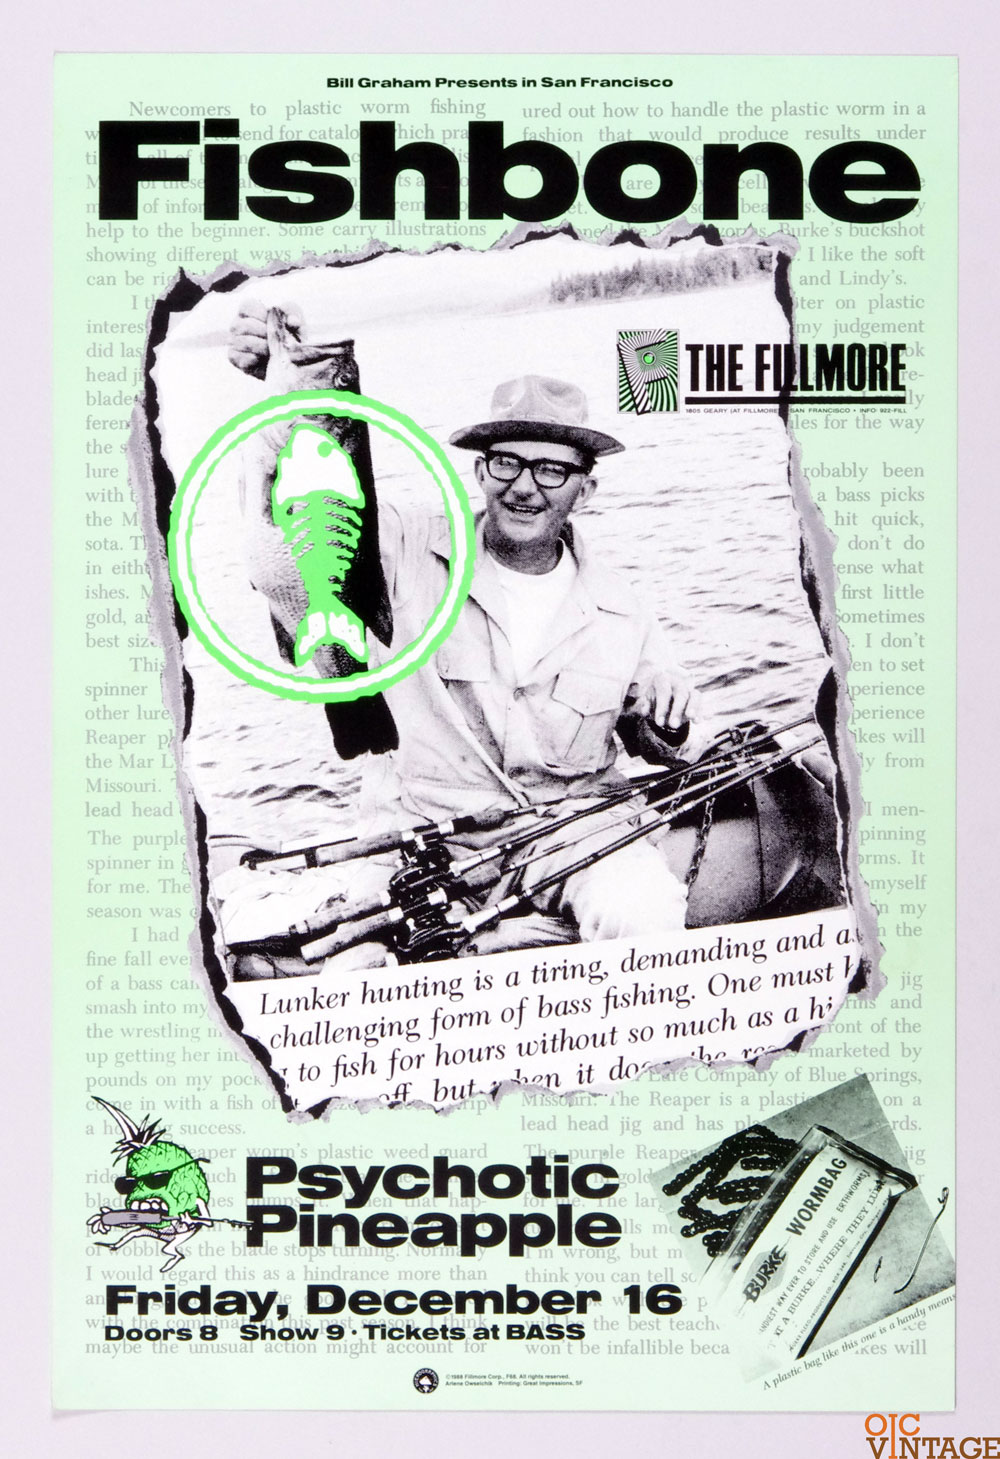 New Fillmore F064 Poster Fishbone Psychotic Pineapple 1988 Dec 16